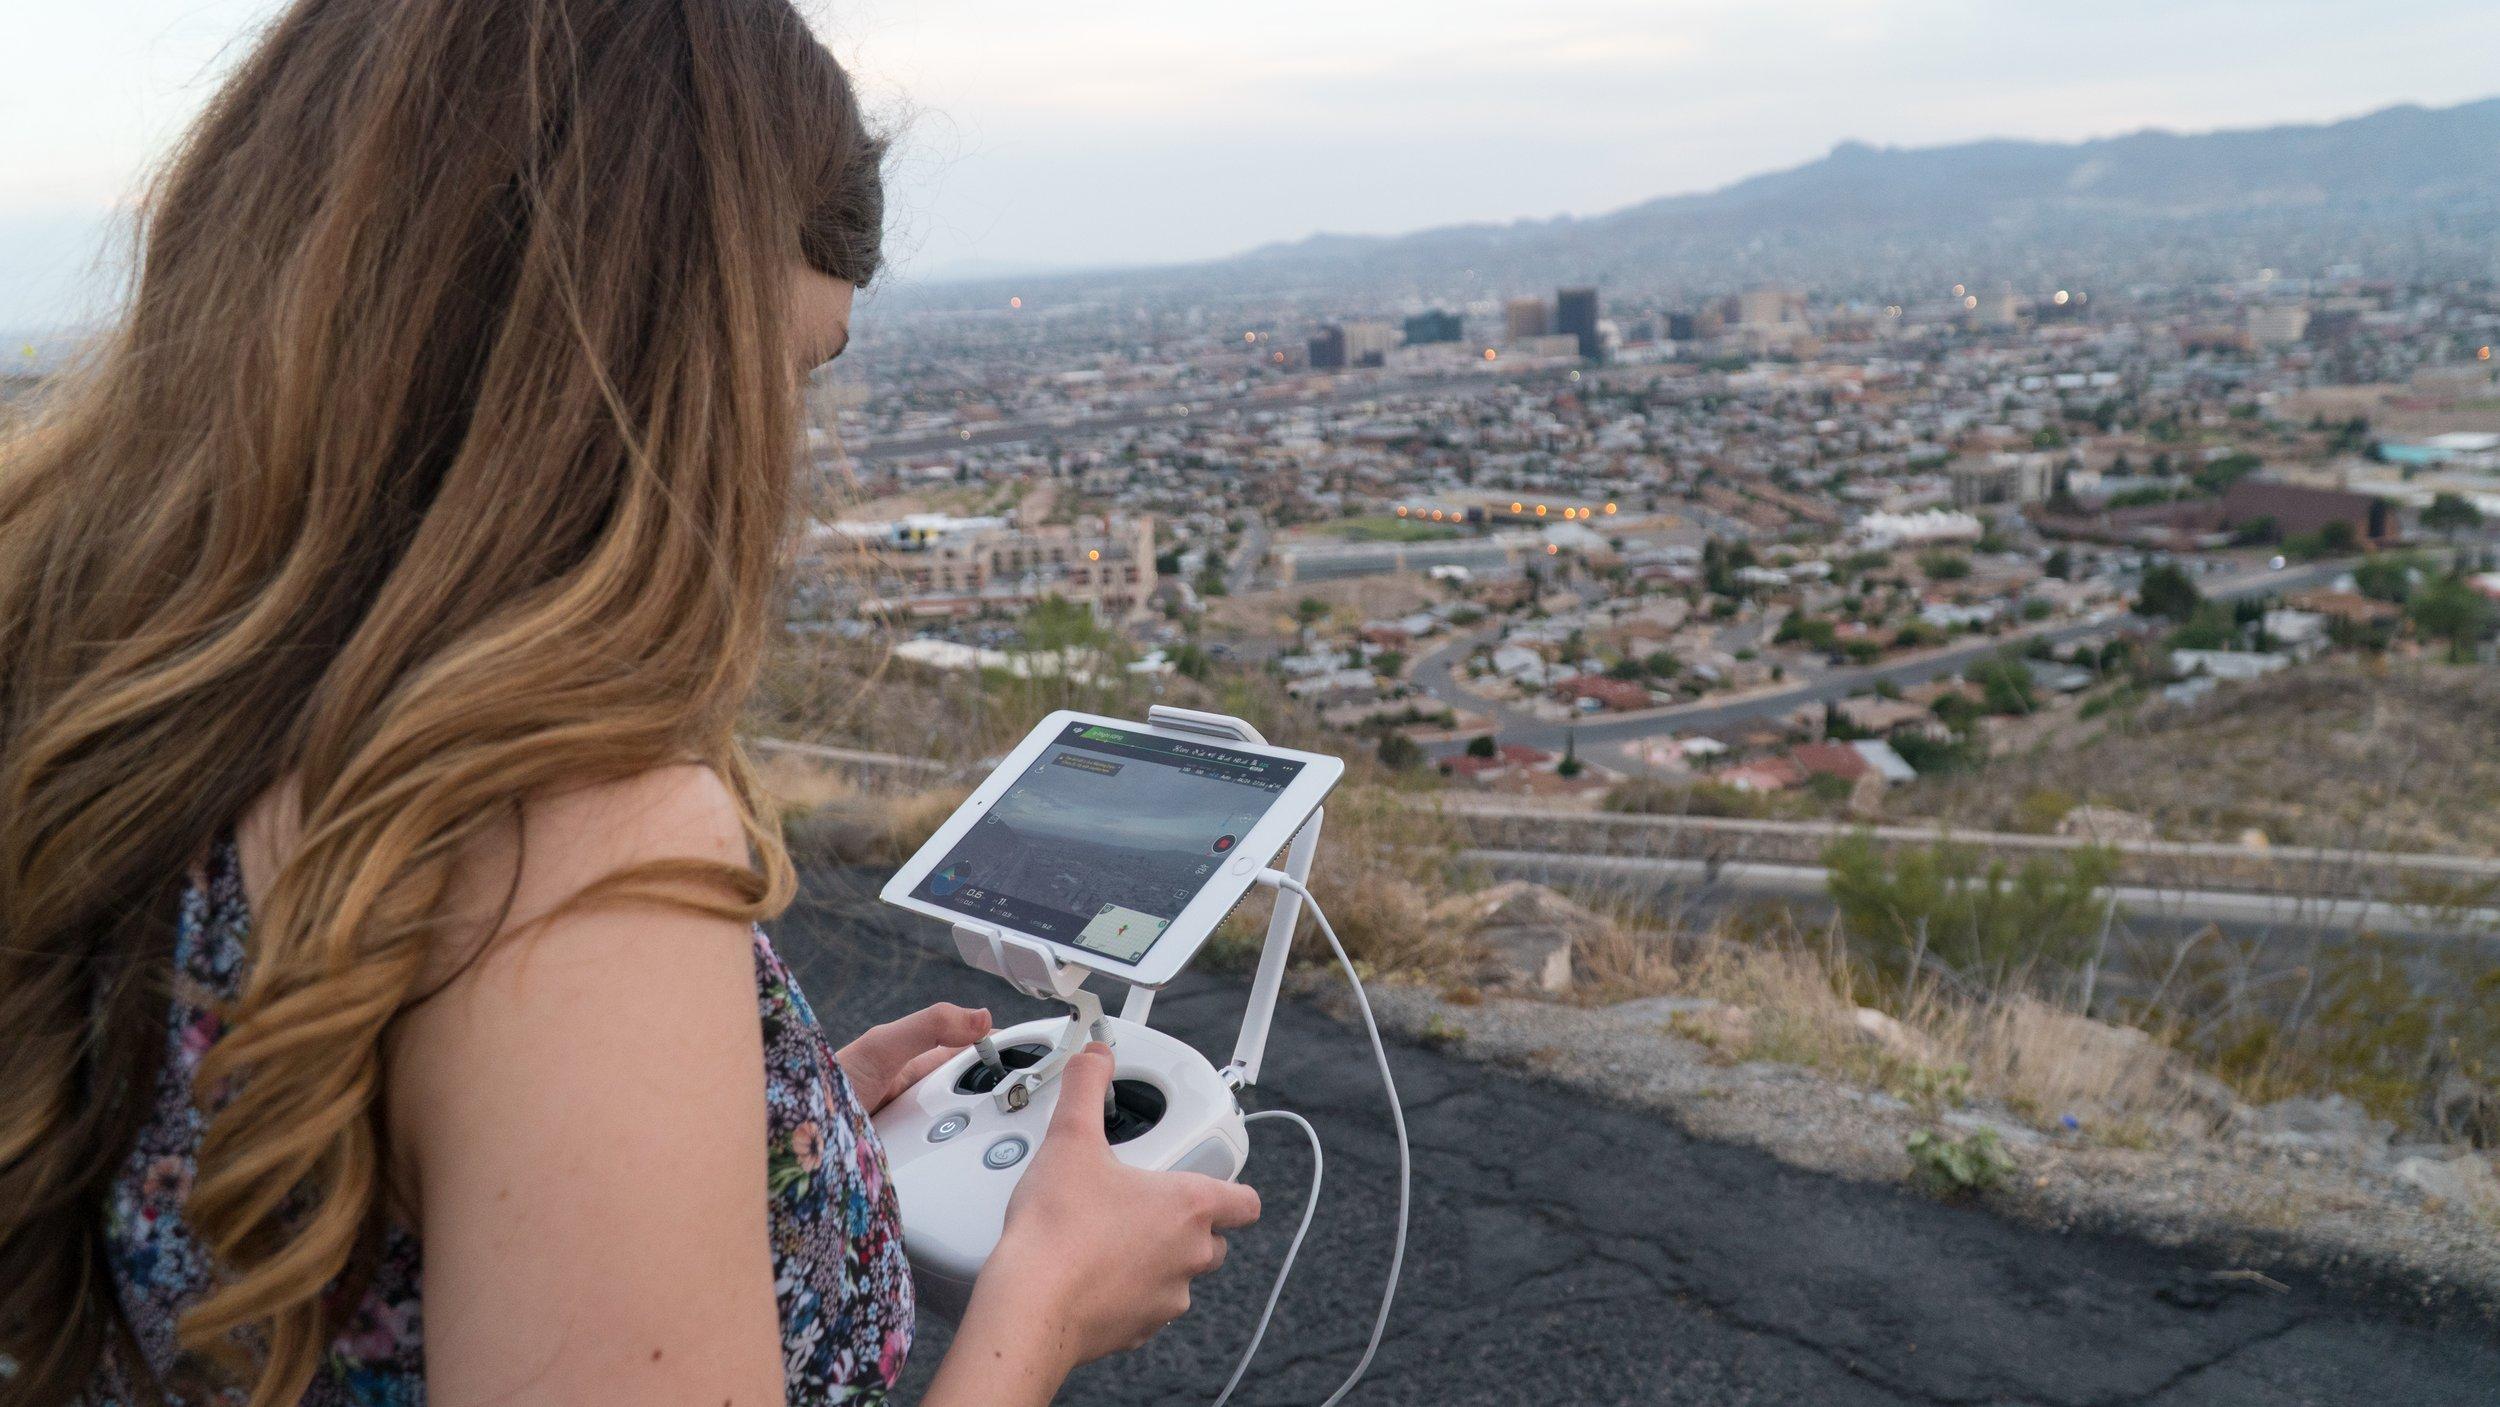 Rachel and drone control 2.jpg